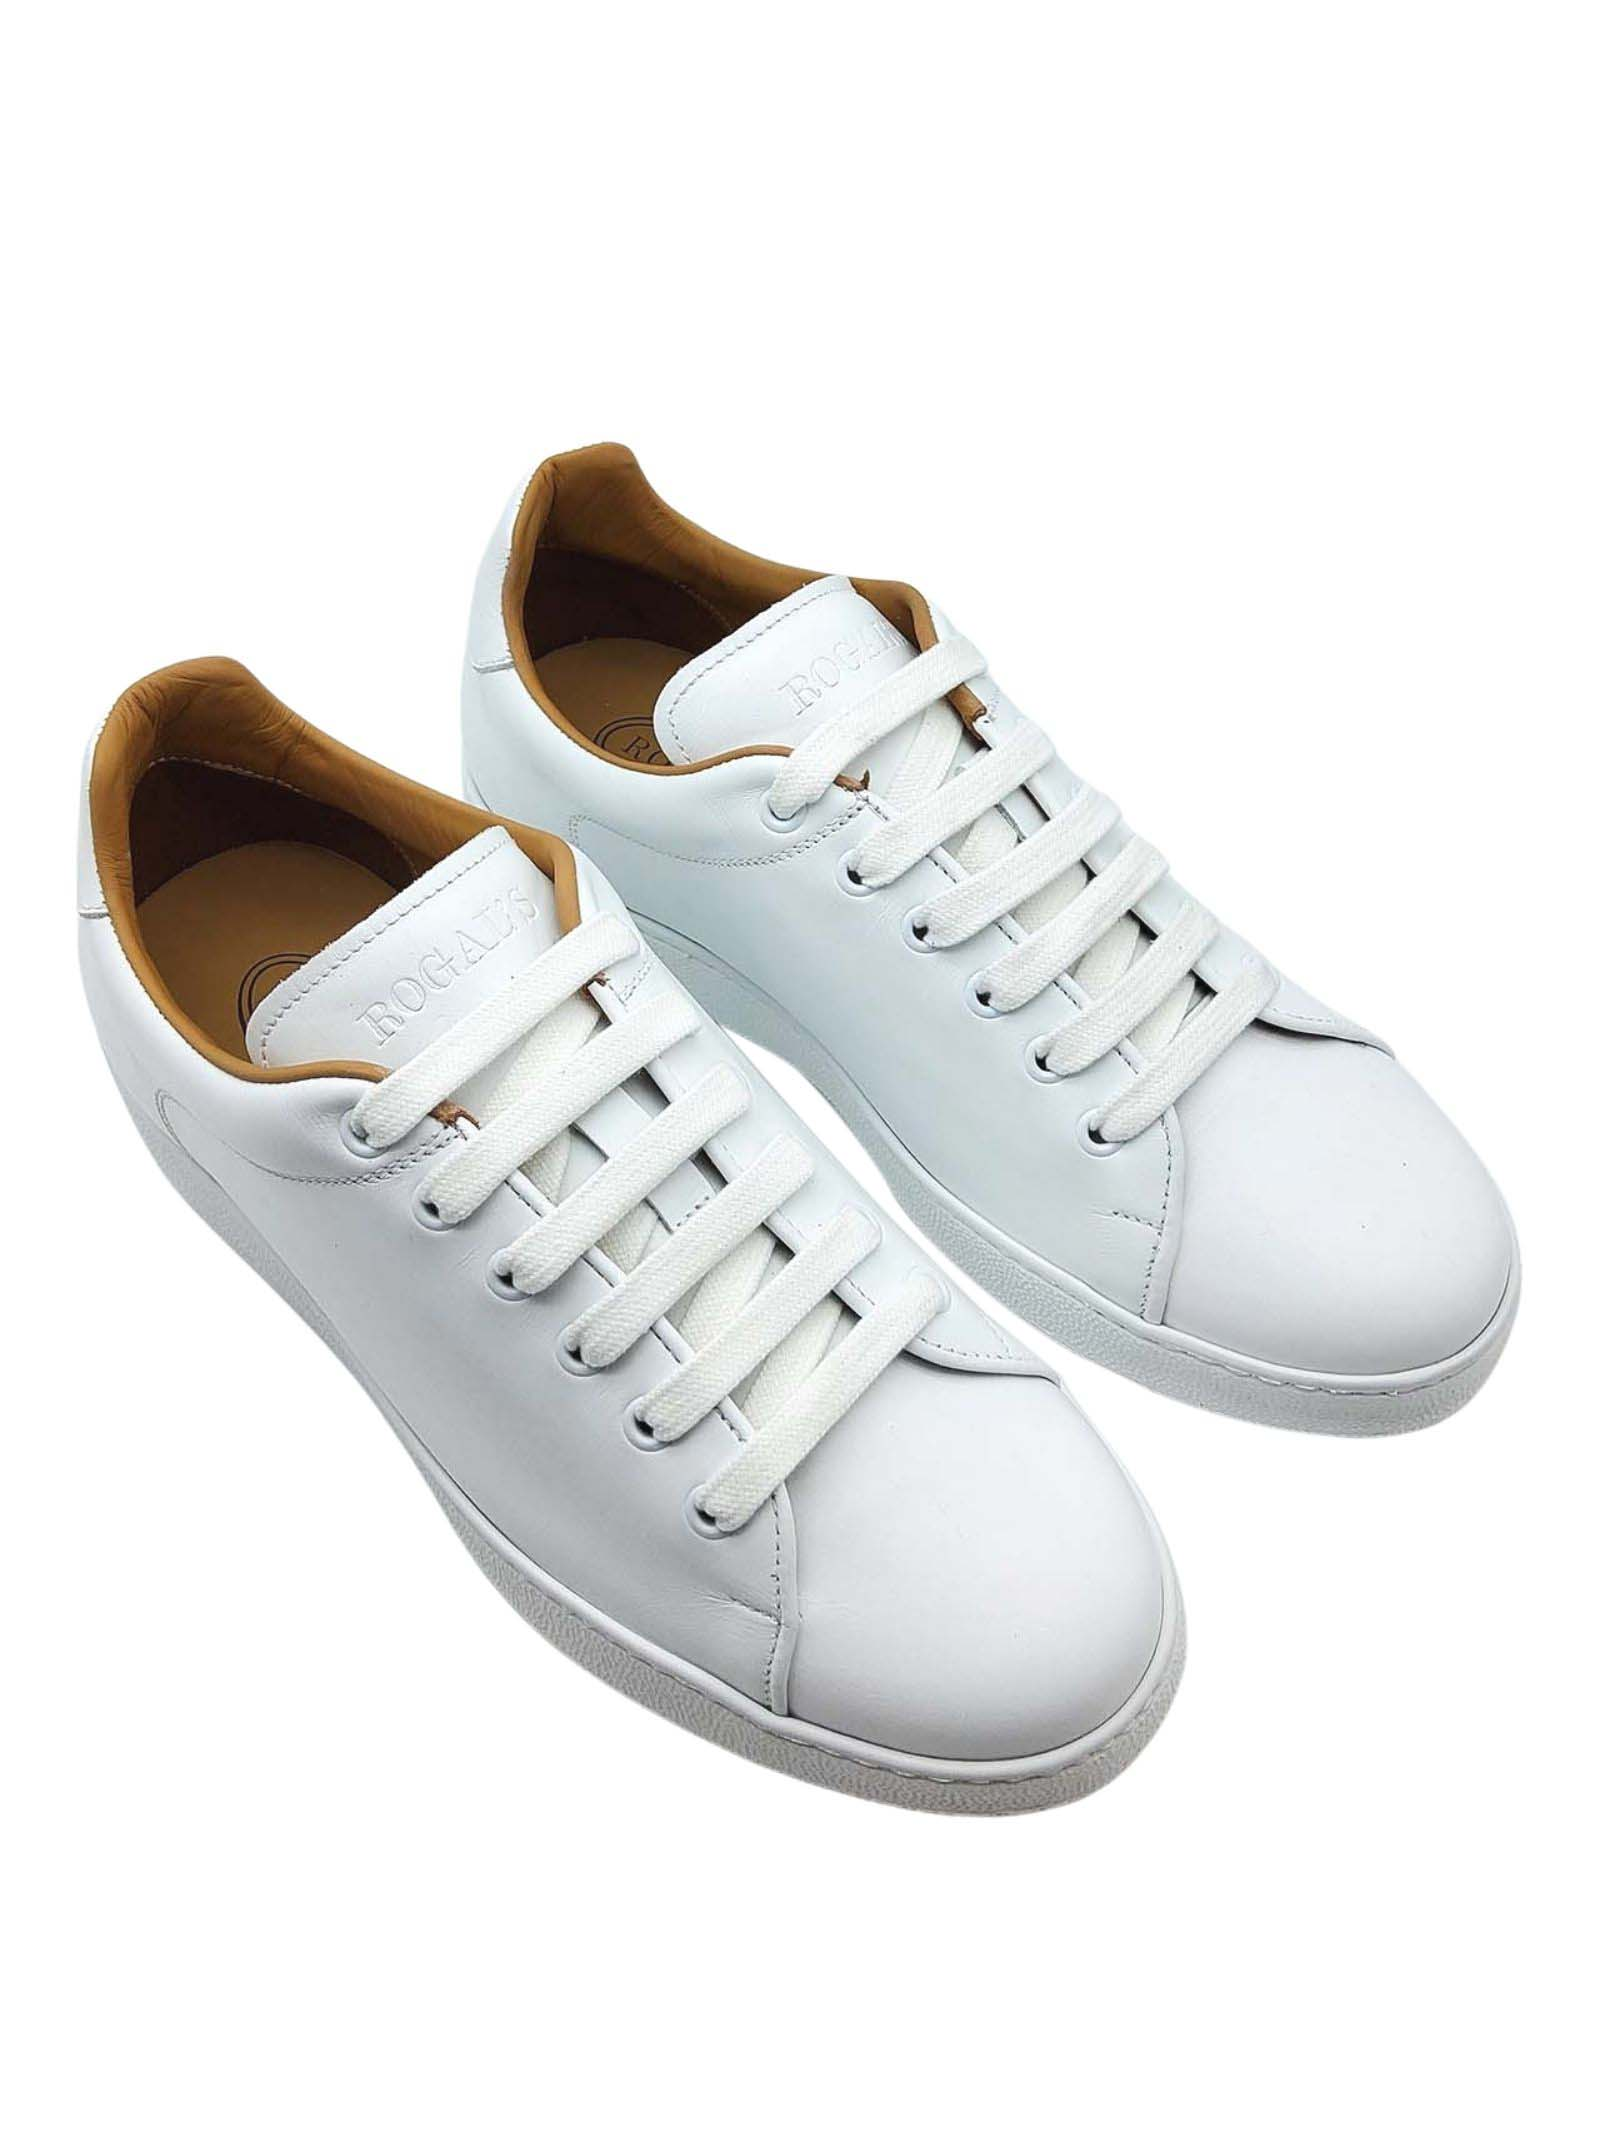 Calzature Uomo Sneakers Stringate in Pelle Bianca e Fodera in Pelle Rogal's | Sneakers | MUR1100